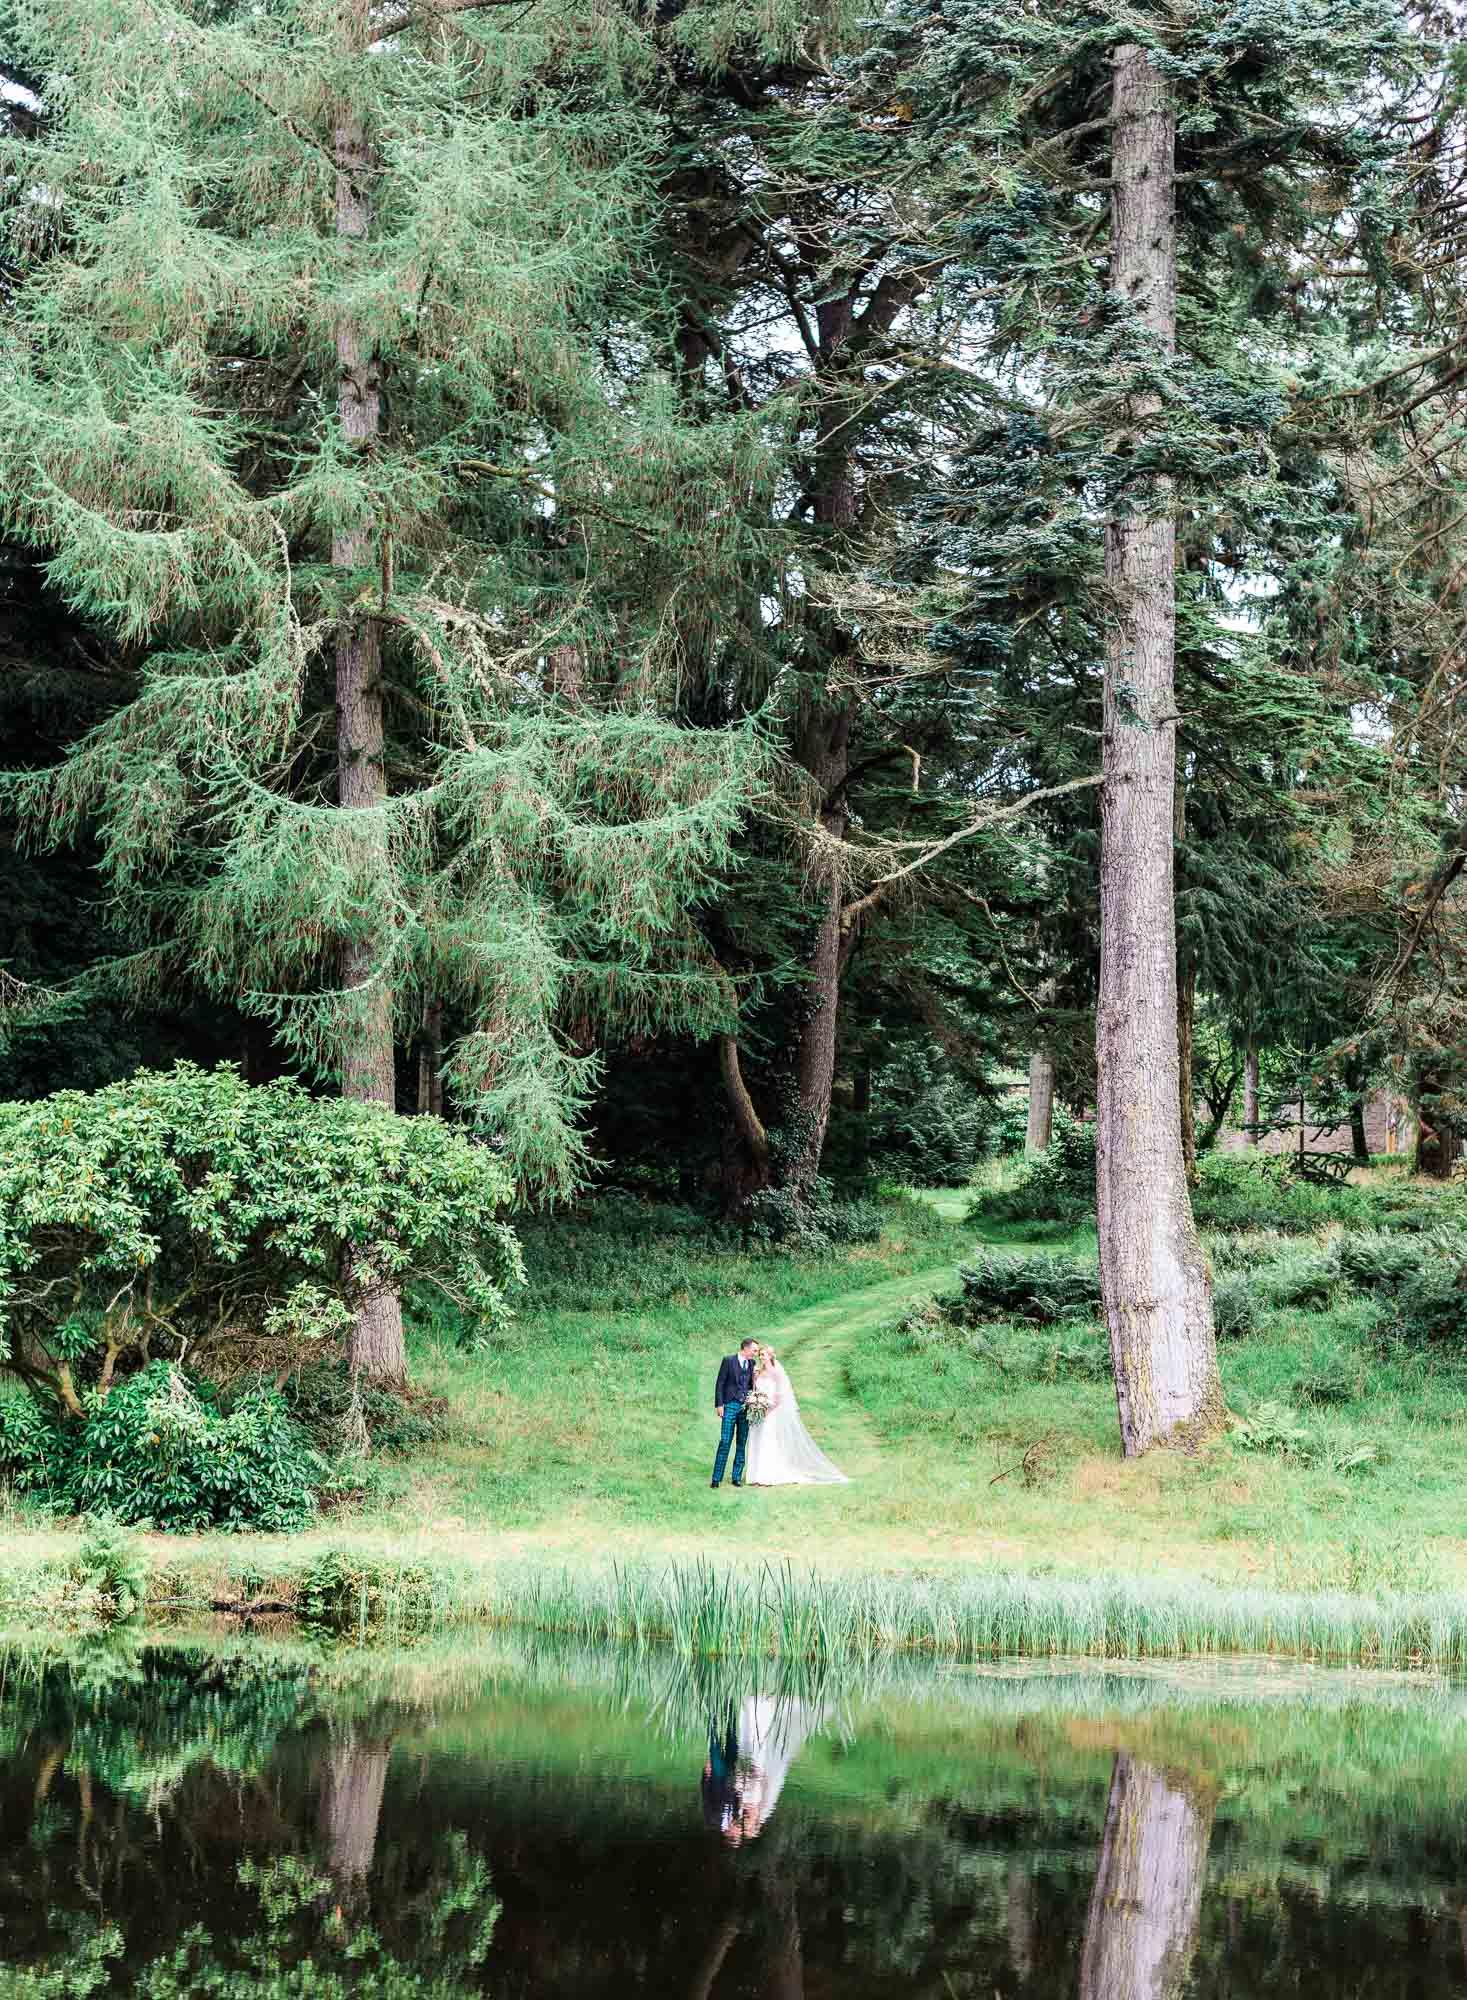 scottish_wedding_blairquhan_castle-80.jpg